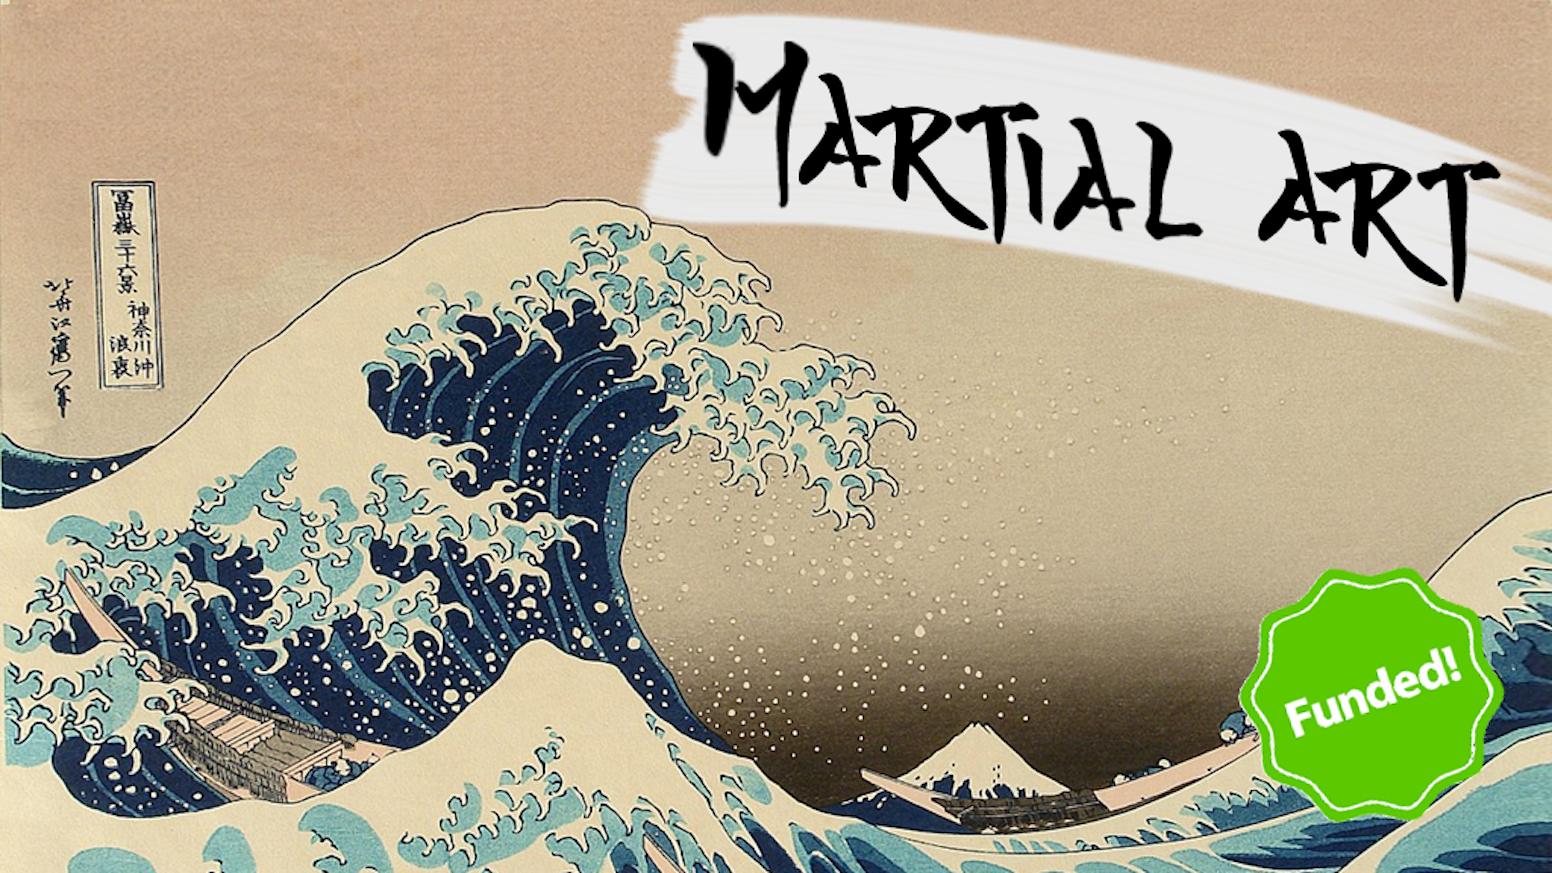 Martial Art - A tactical card game by Jonathan Ruland — Kickstarter